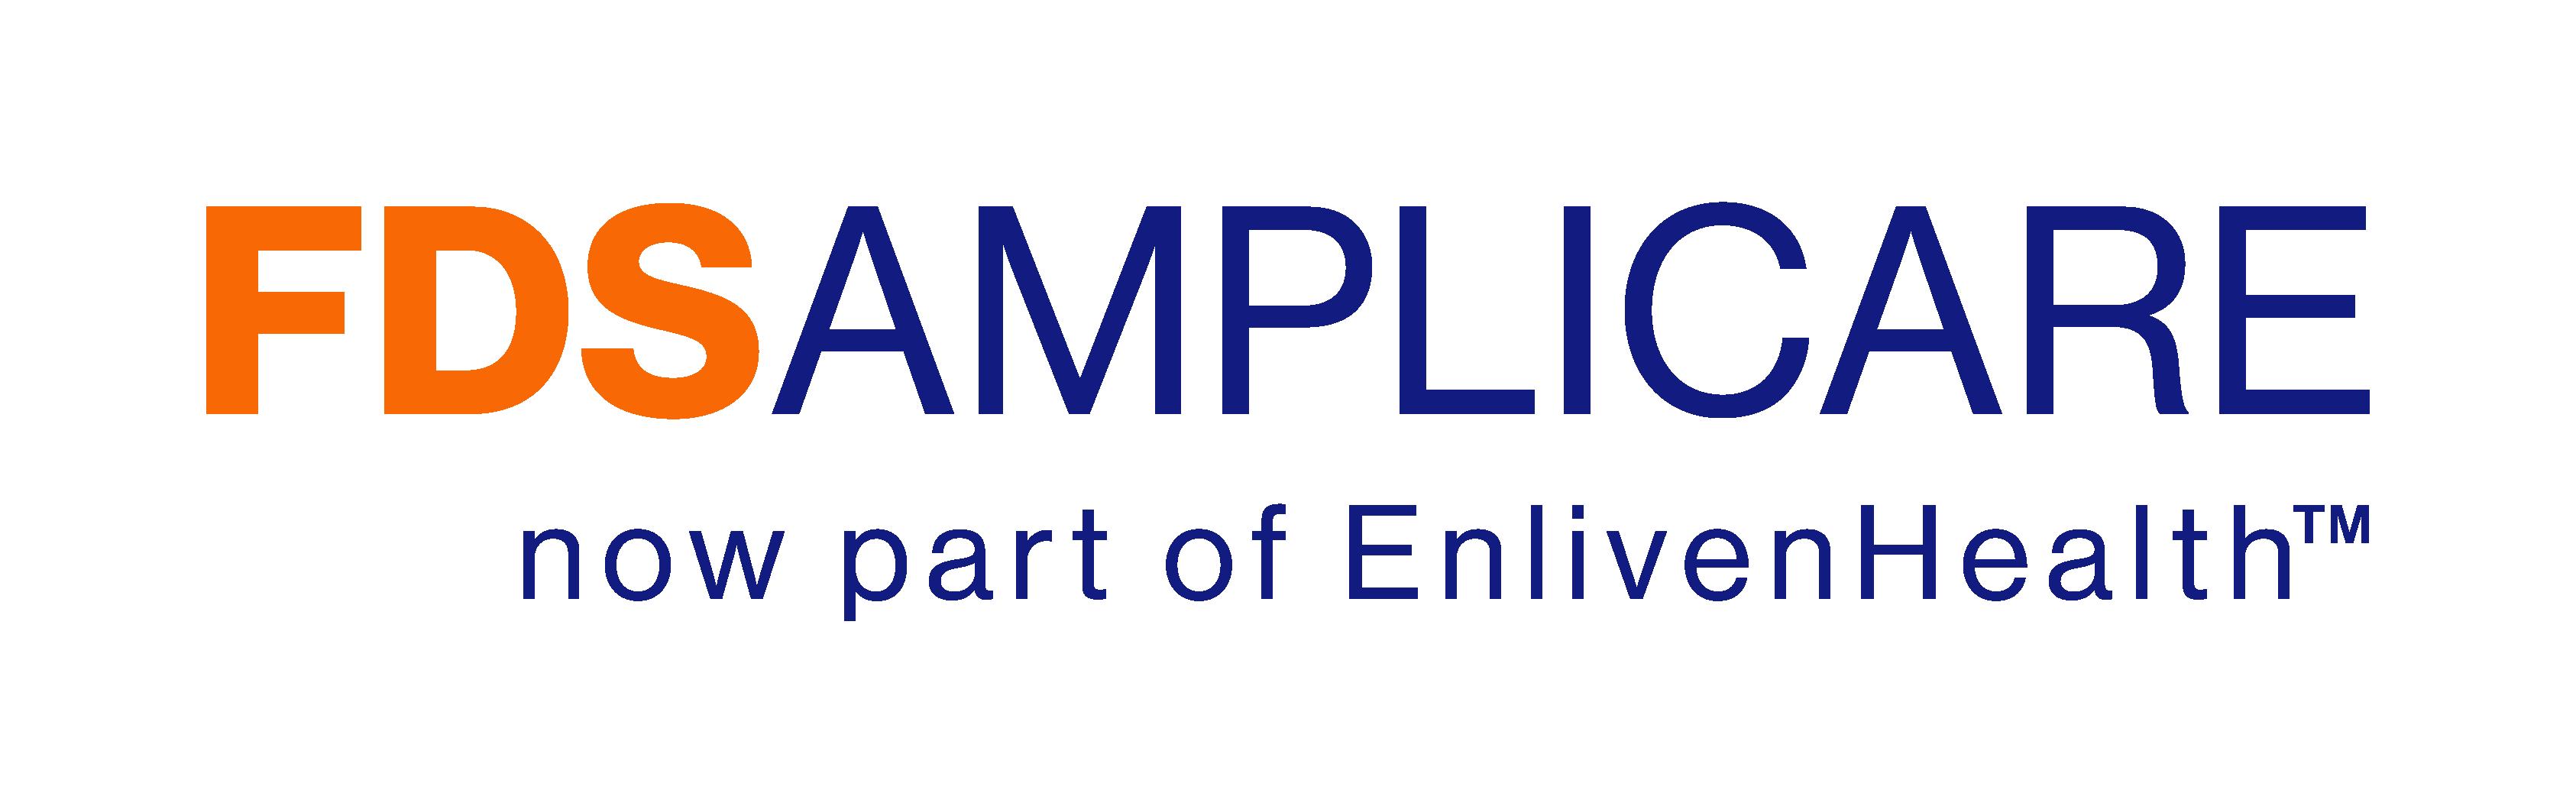 FDS Amplicare_EnlivenHealth Tag_RGB